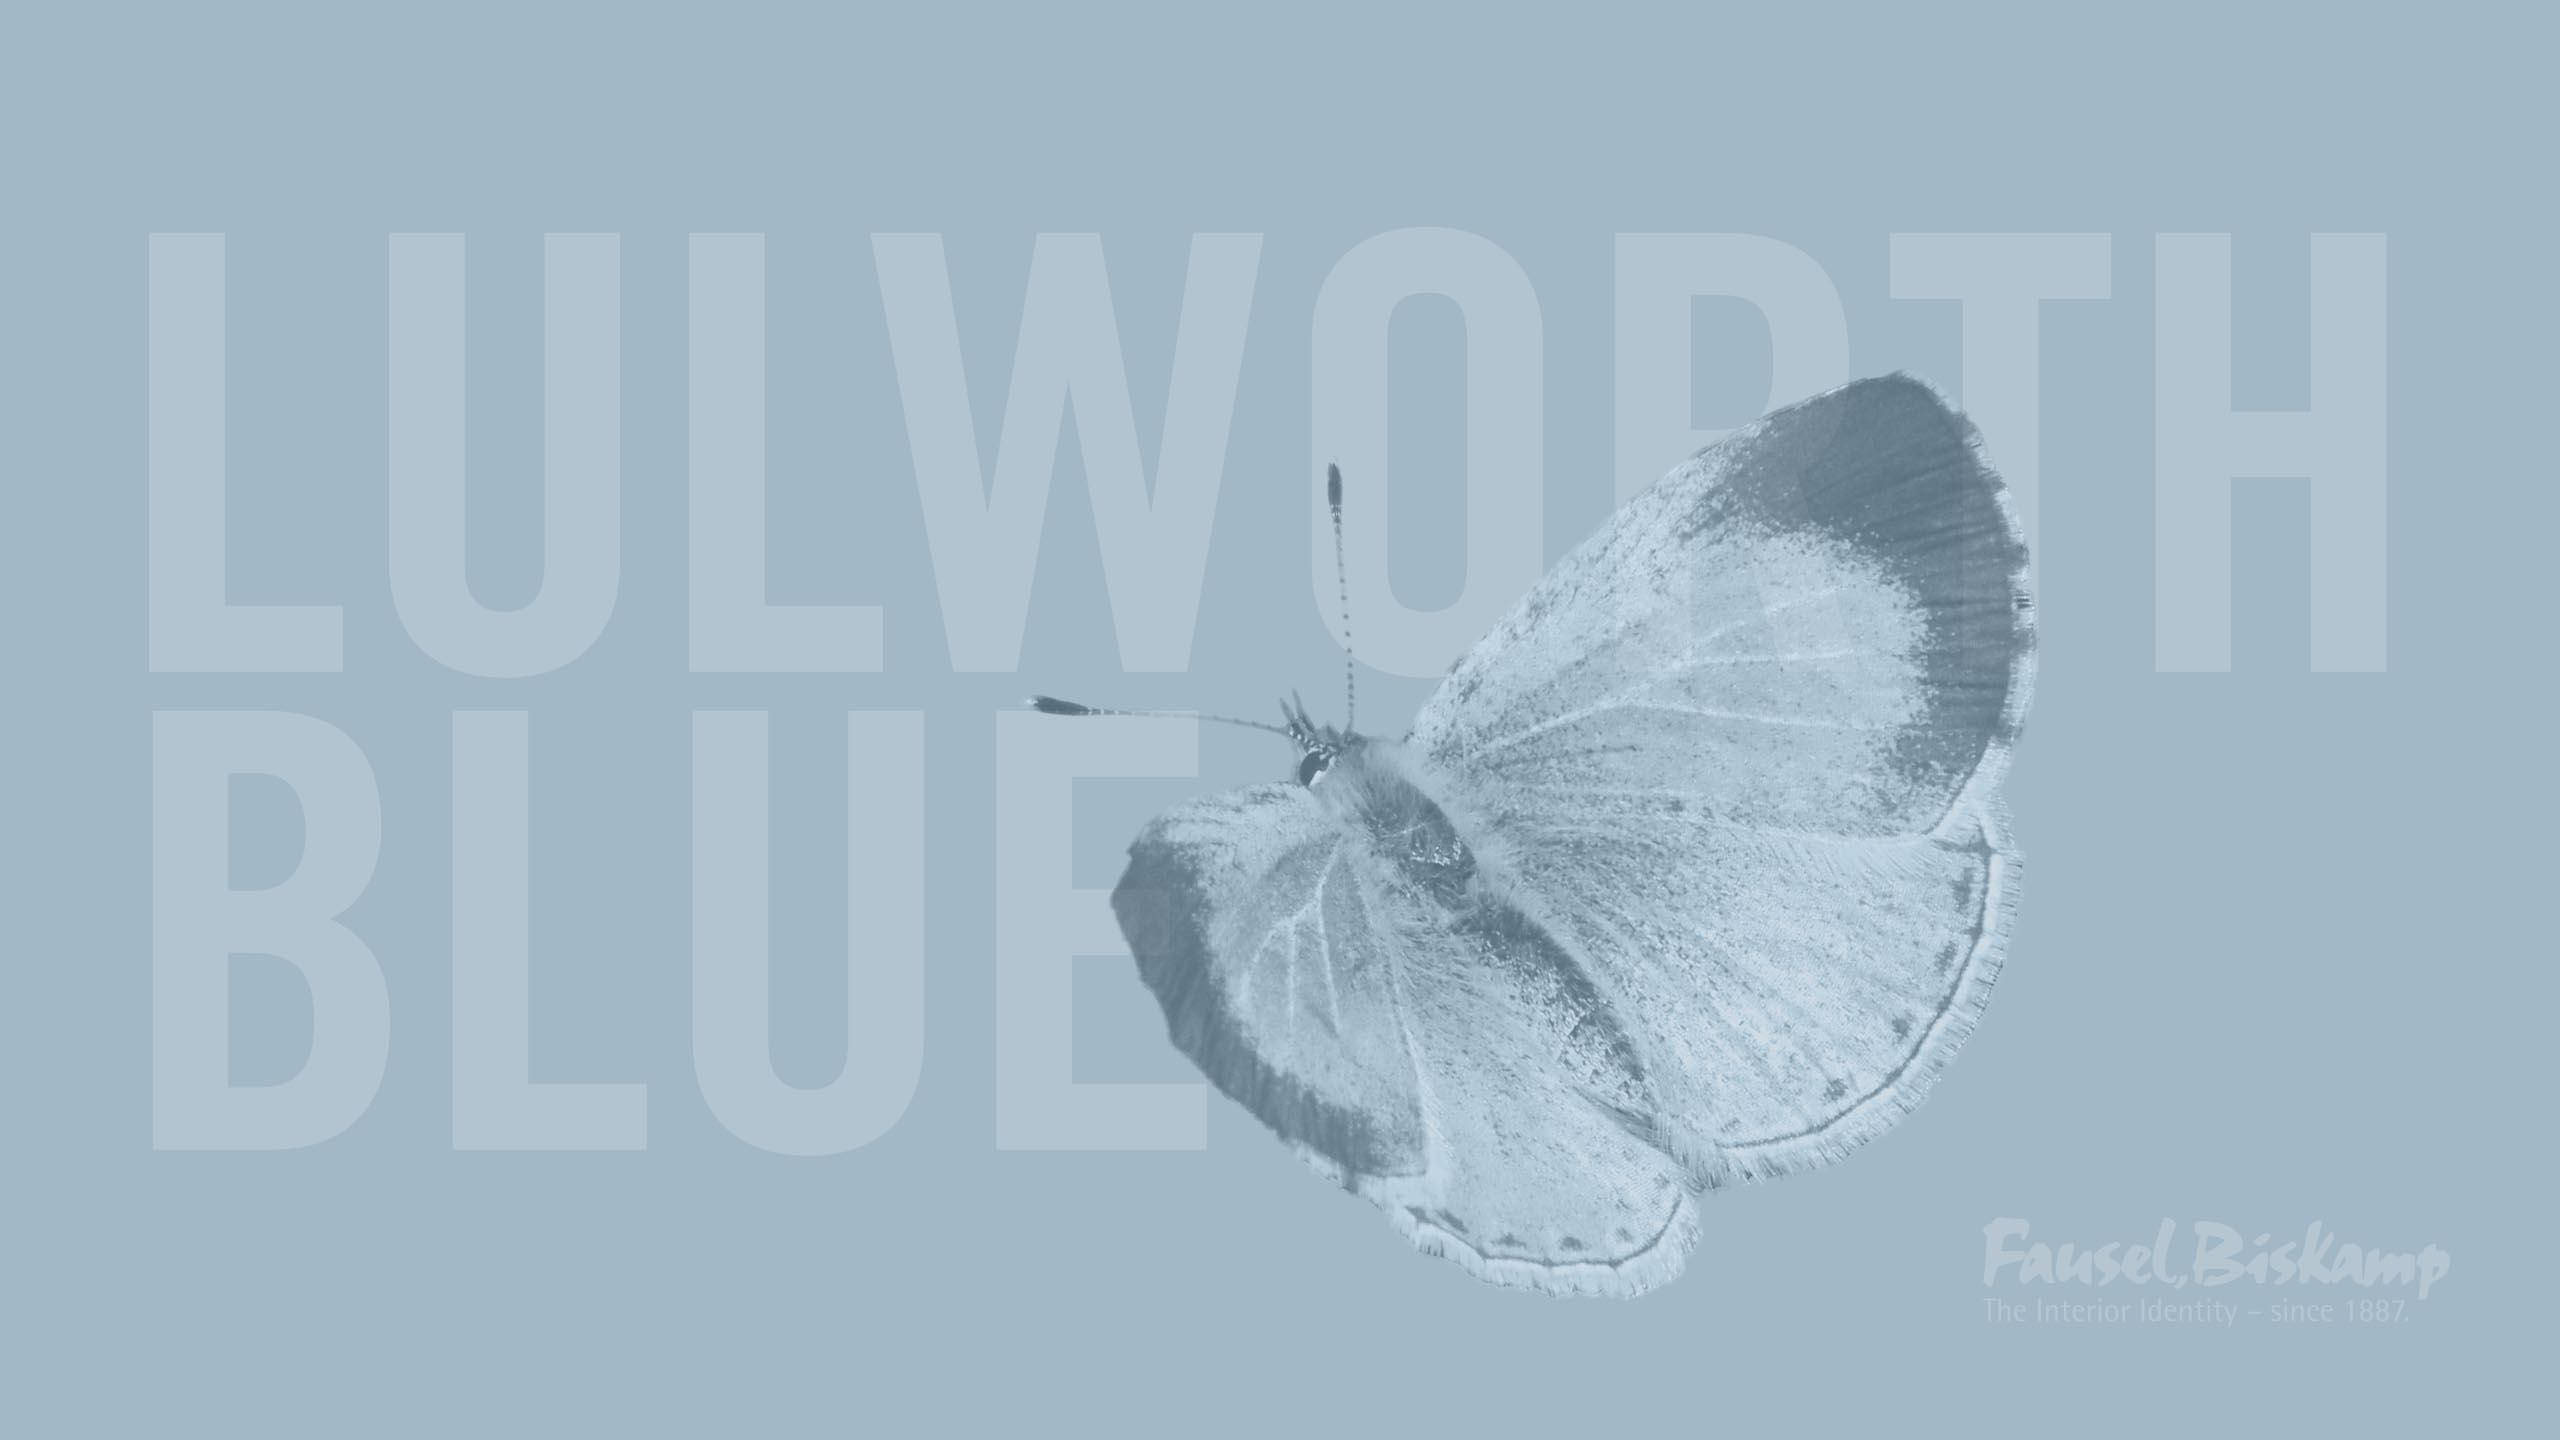 Lulworth Blue (No. 89)